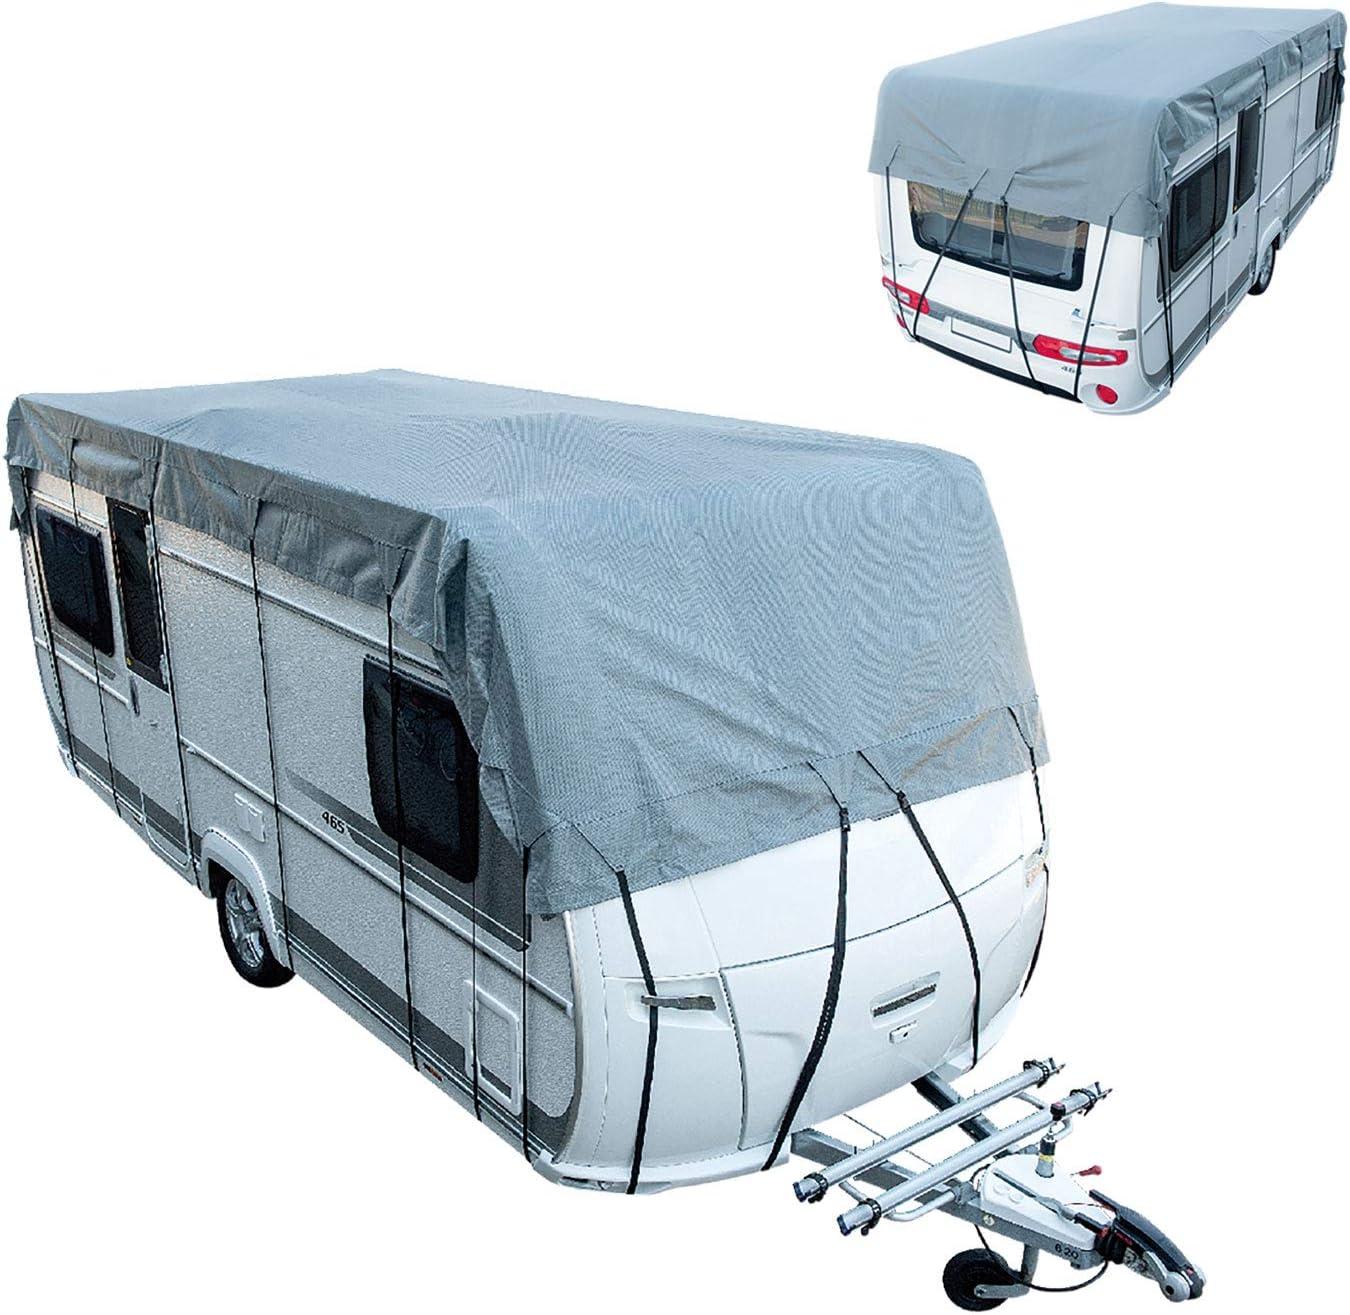 Cartrend Caravan 10265 Dachschutzplane Plane Dachplane Dachschutz Caravan Schutzhülle Abdeckplane Dachschutz Caravan Auto